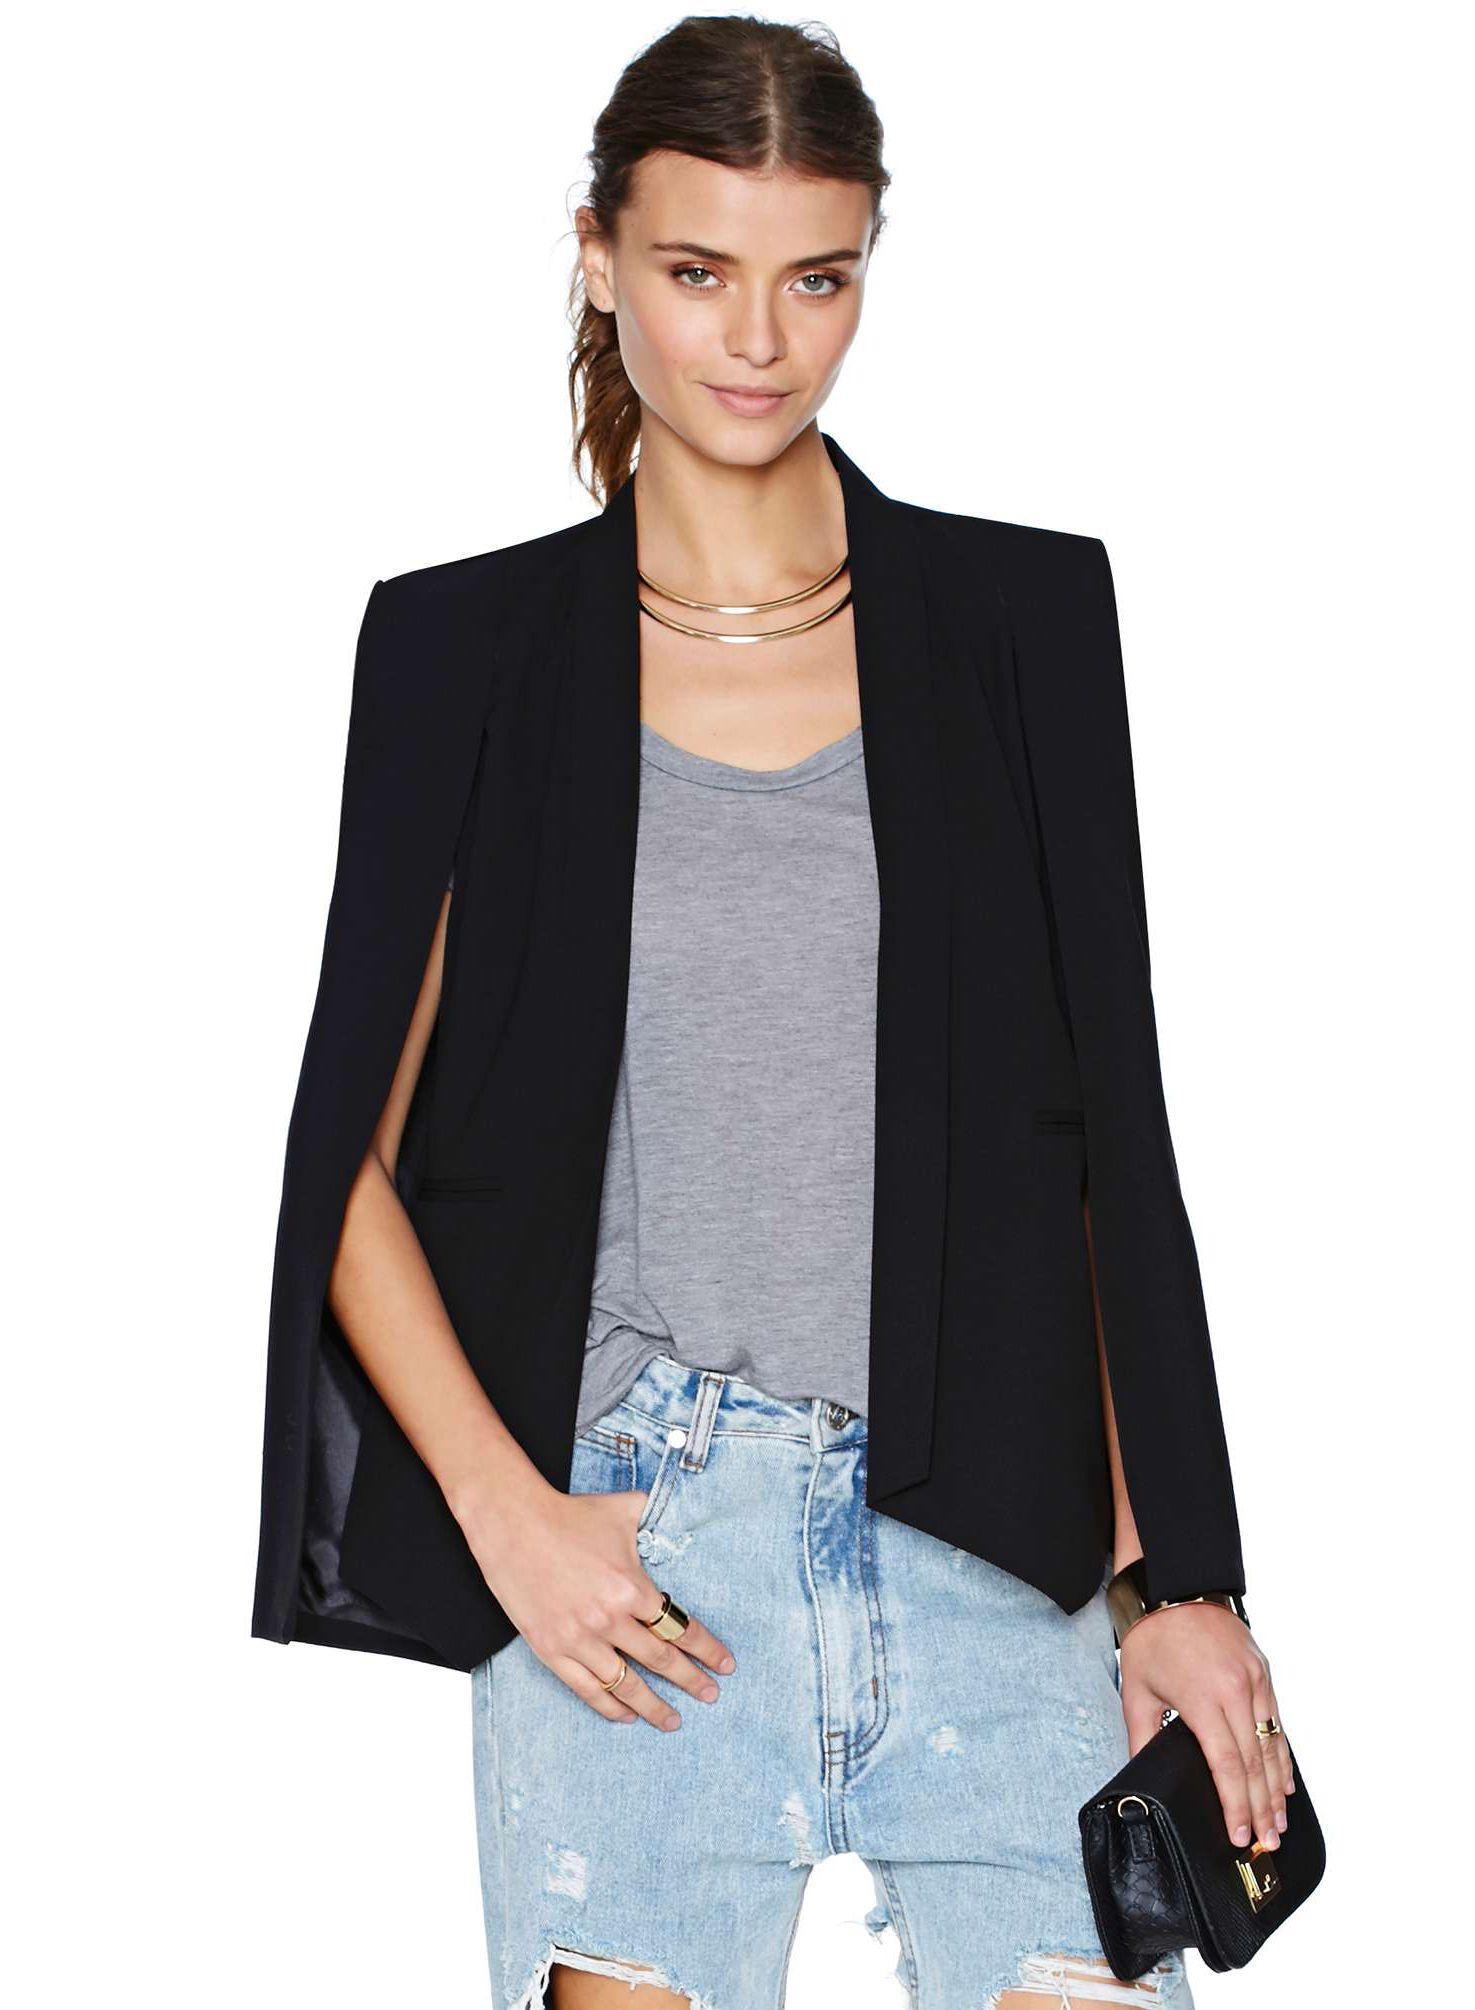 Blazers Suits & Sets Women Long Suit Blazer Office Lady Coat Solid Long Sleeves Cape Poncho Female Elegant Jacket Womens Formal Suit Blazer Feminino